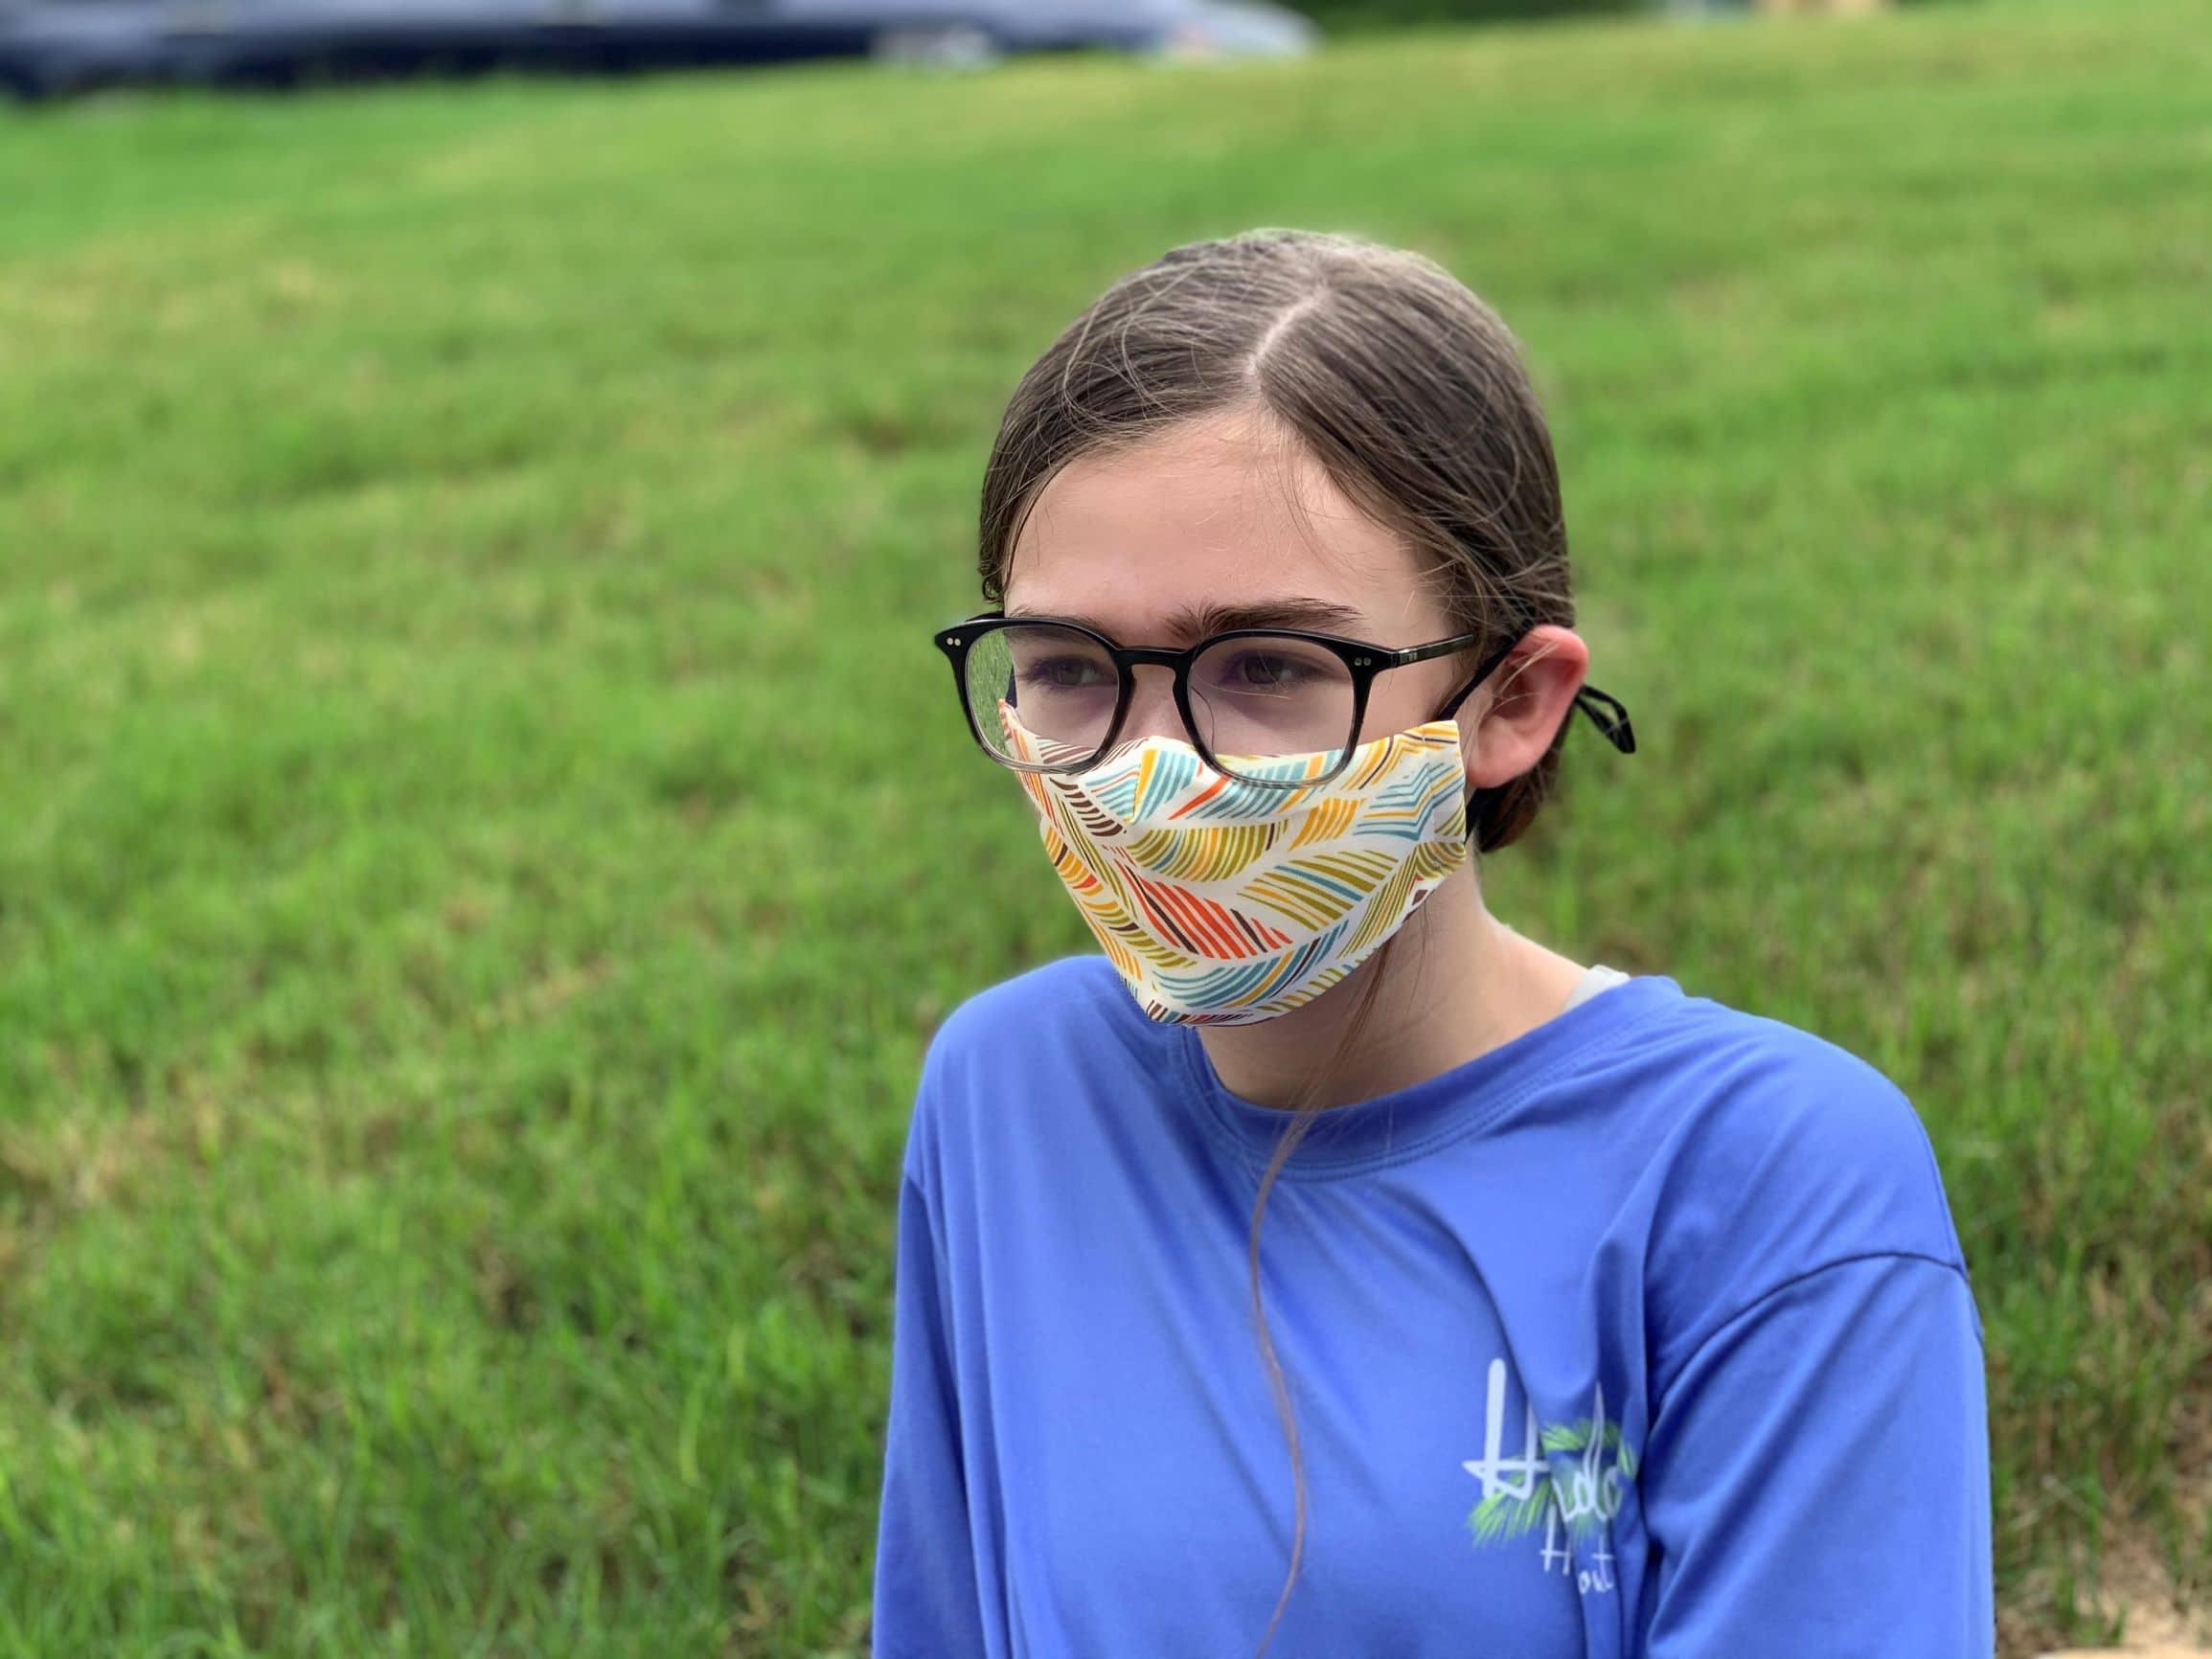 Girl wearing face mask from fase wear